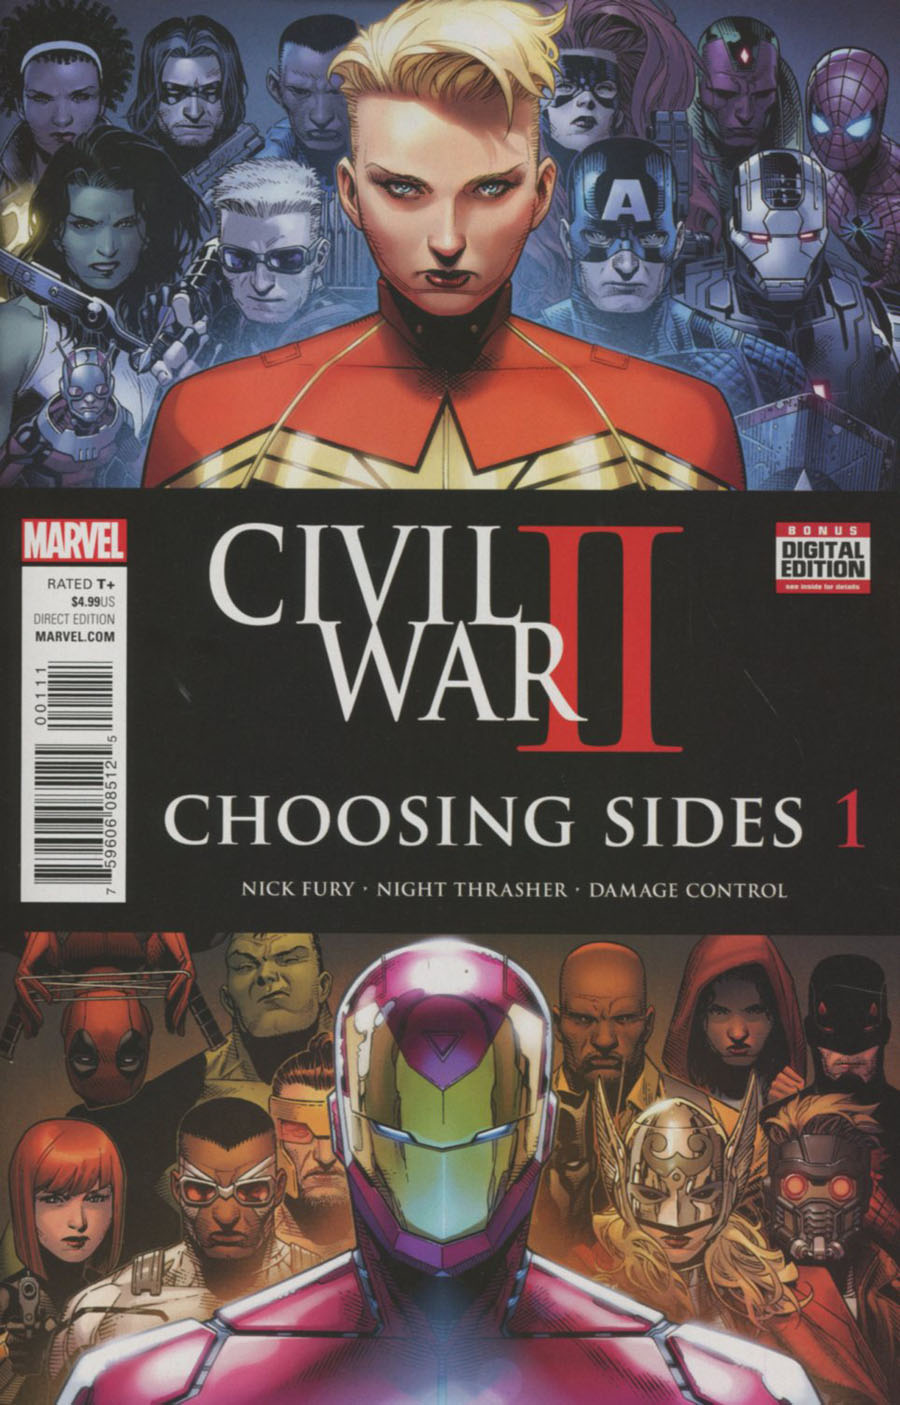 Civil War II Choosing Sides #1 Cover A Regular Jim Cheung Cover